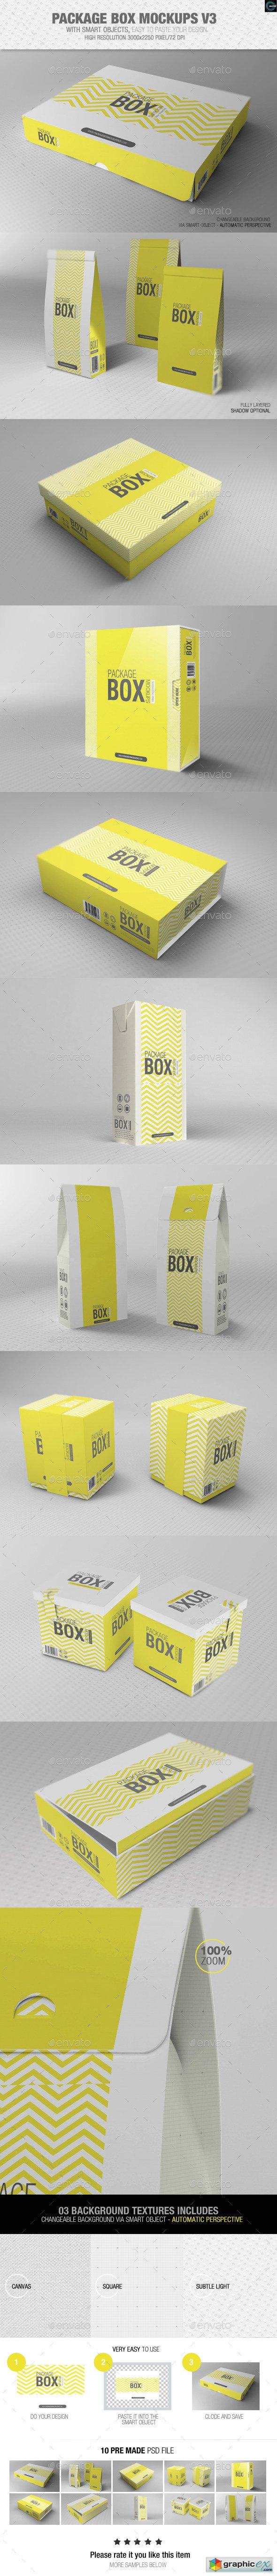 Download Package Box Mockups Vol3 Box Mockup Packaging Mockup Box Packaging